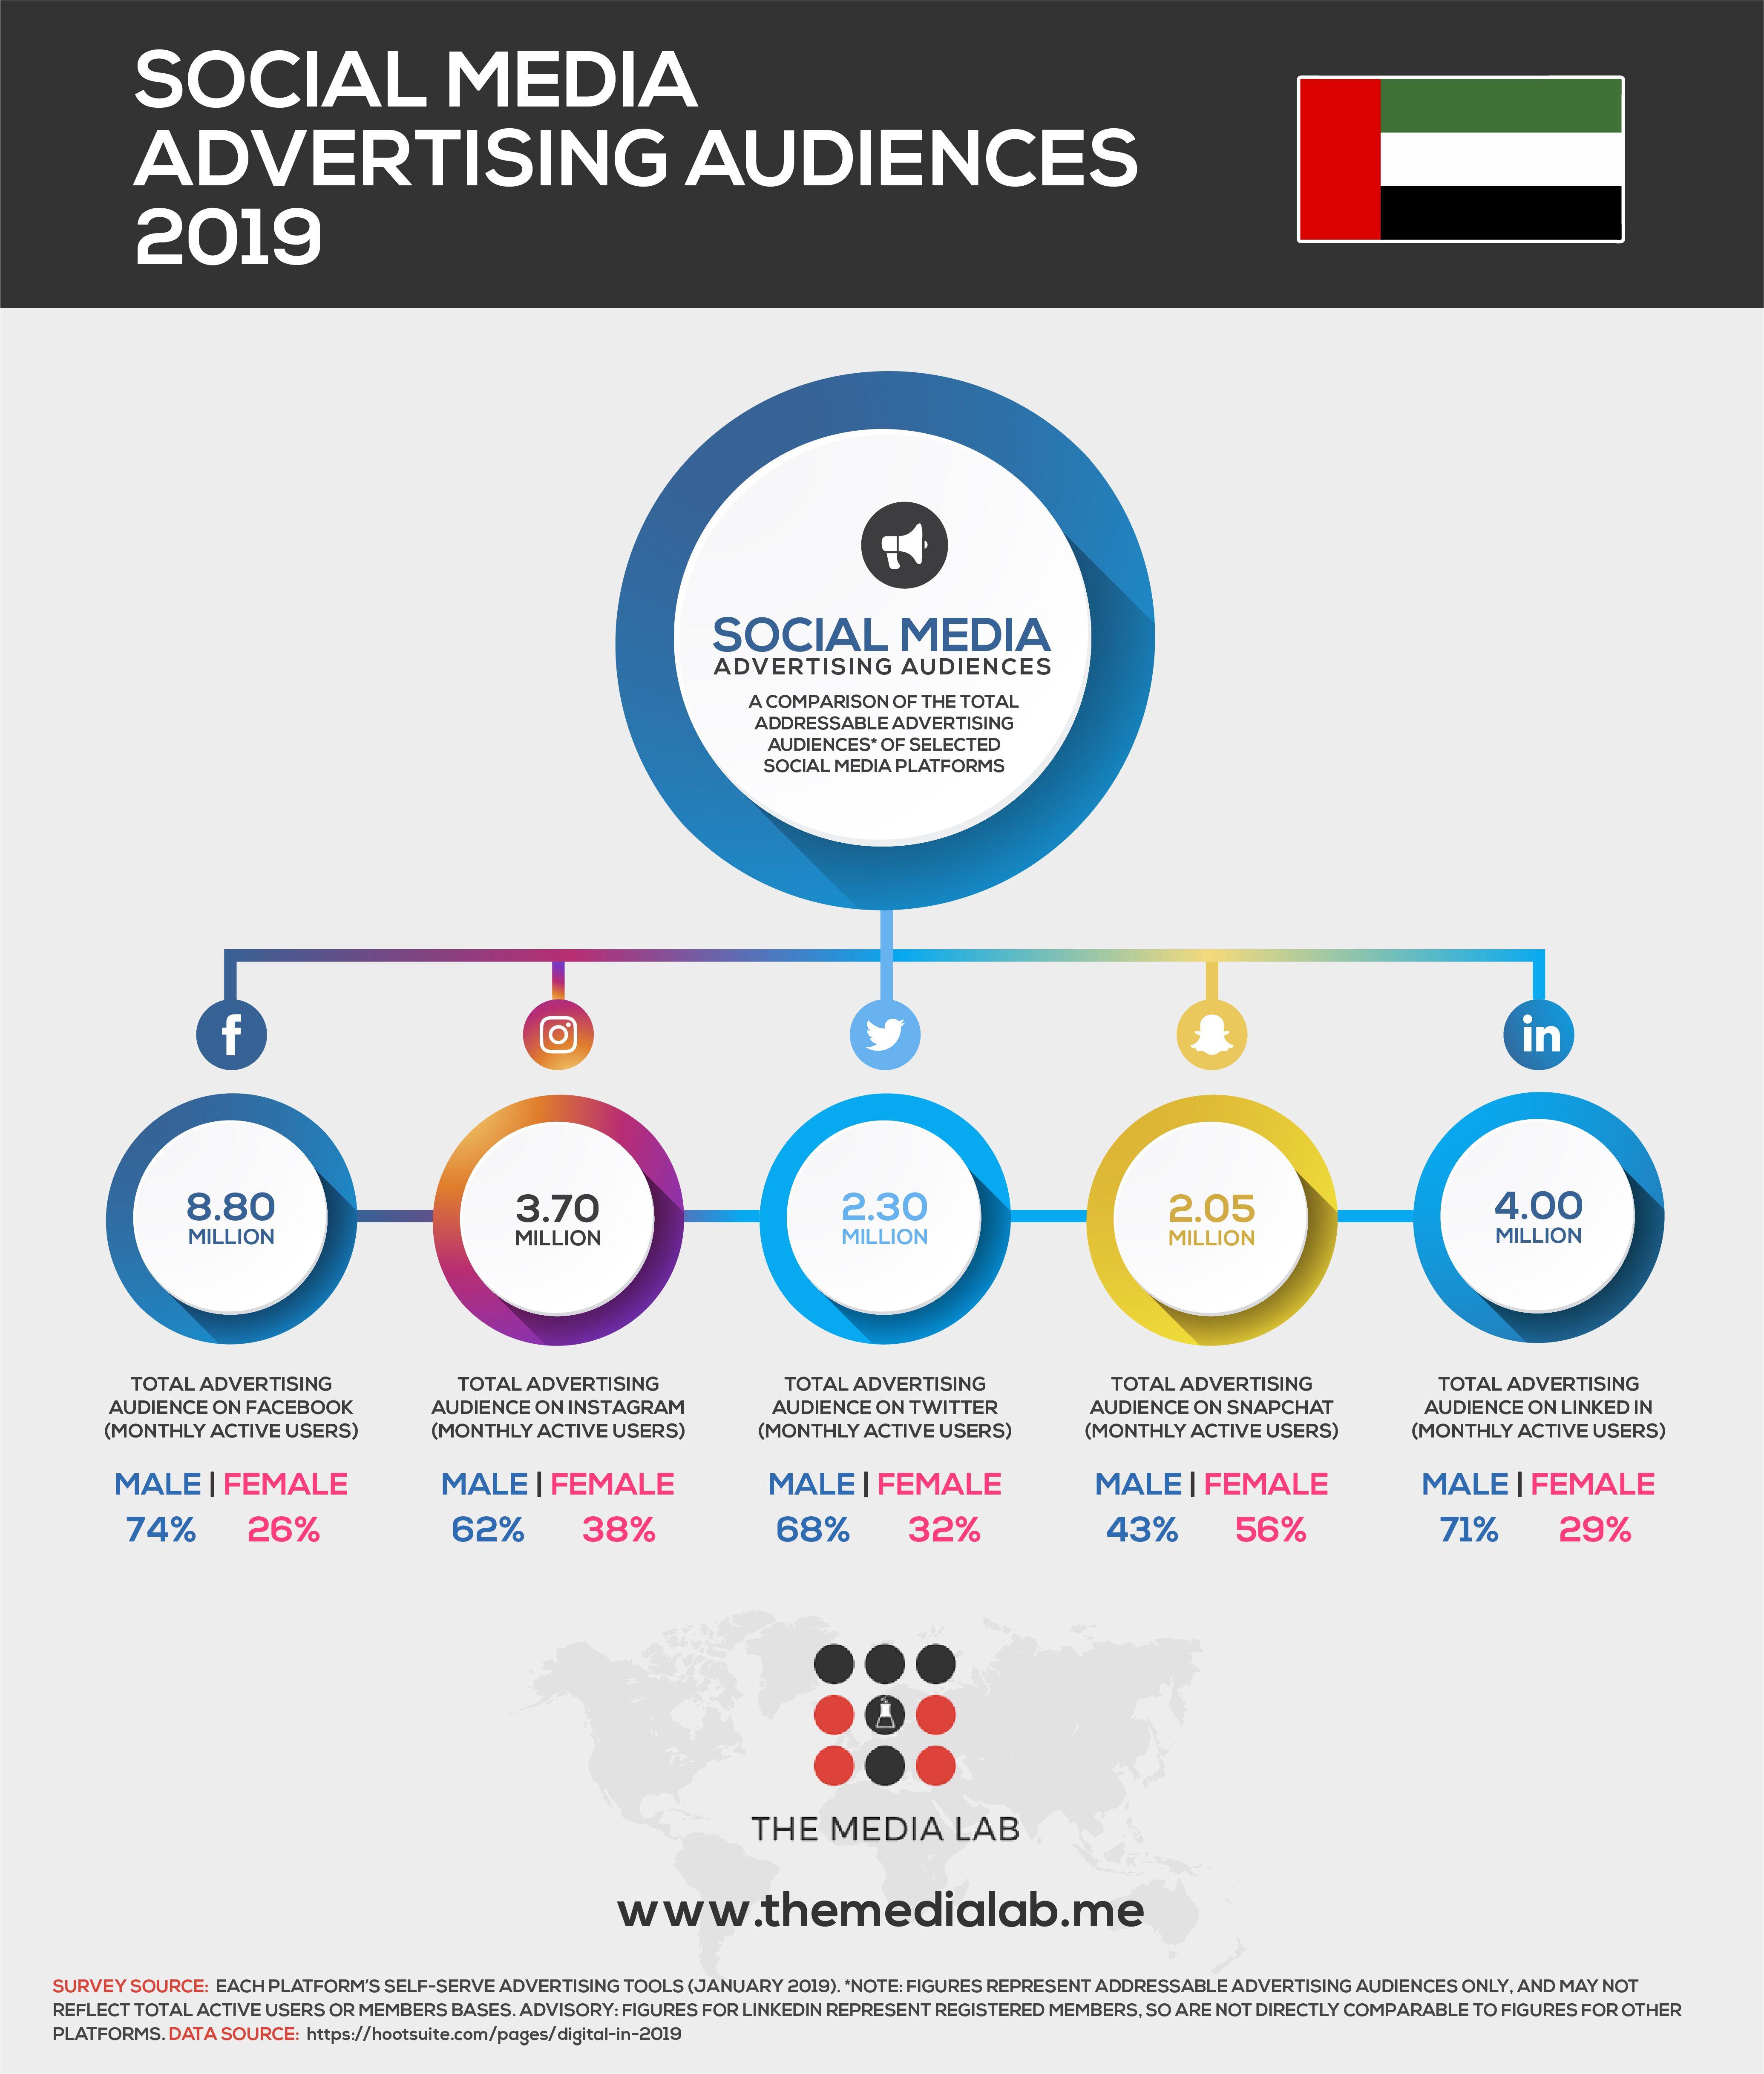 Social Media Audience In Uae 2019 Social Media Statistics Social Media Advertising Infographic Health